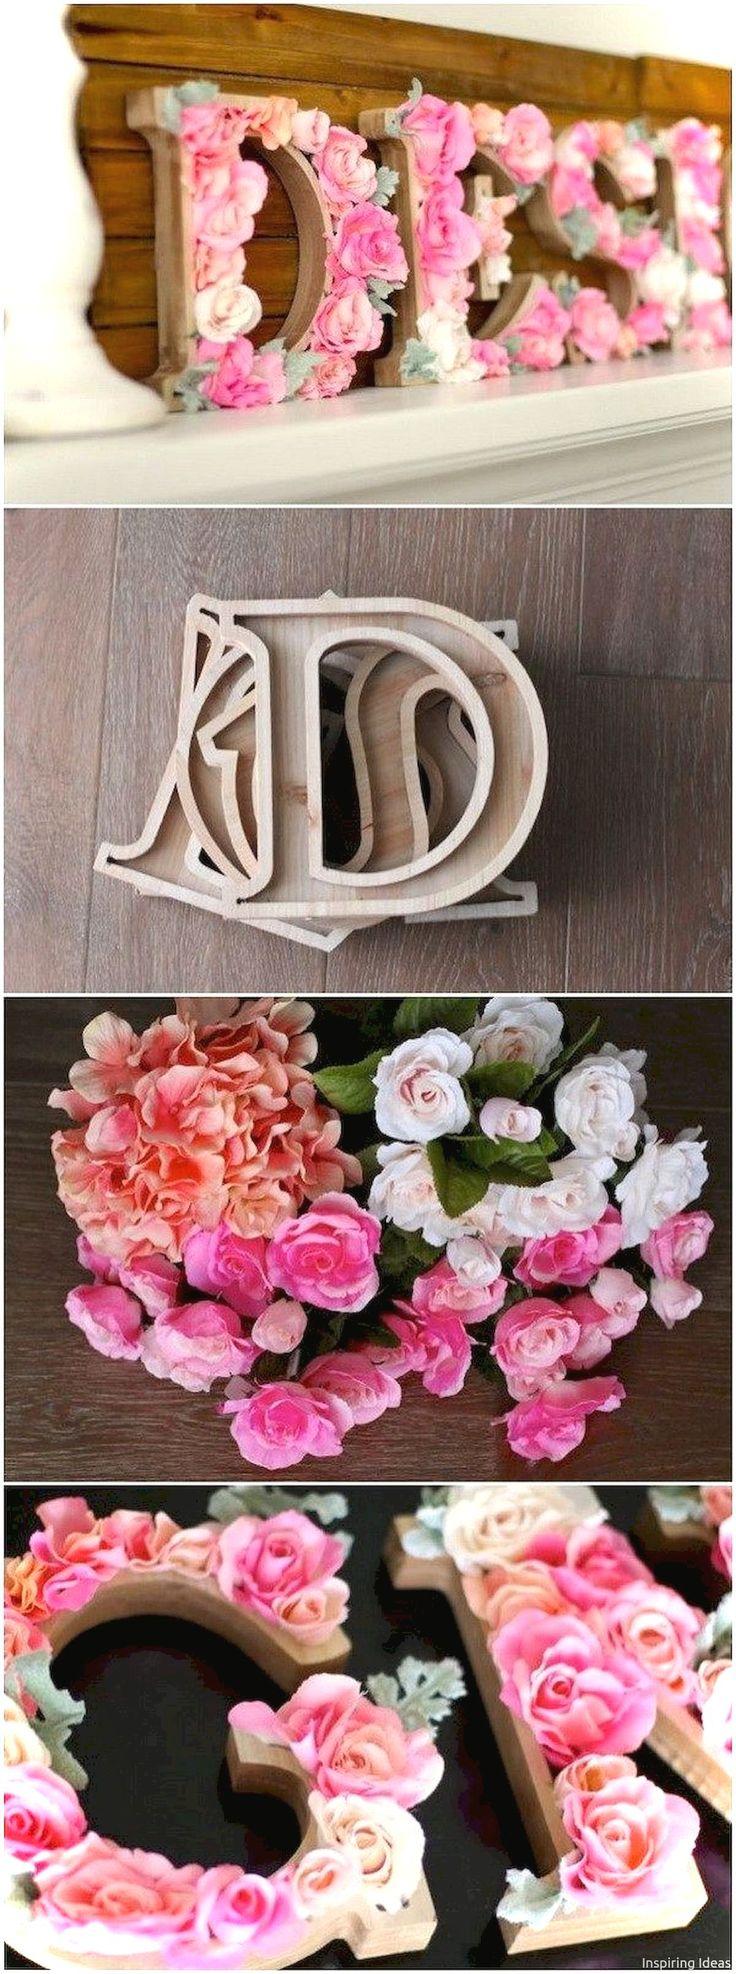 Nice 40 Cute Craft Ideas for Teen Girl Bedroom https://decorisart.com/28/40-cute-craft-ideas-teen-girl-bedroom/